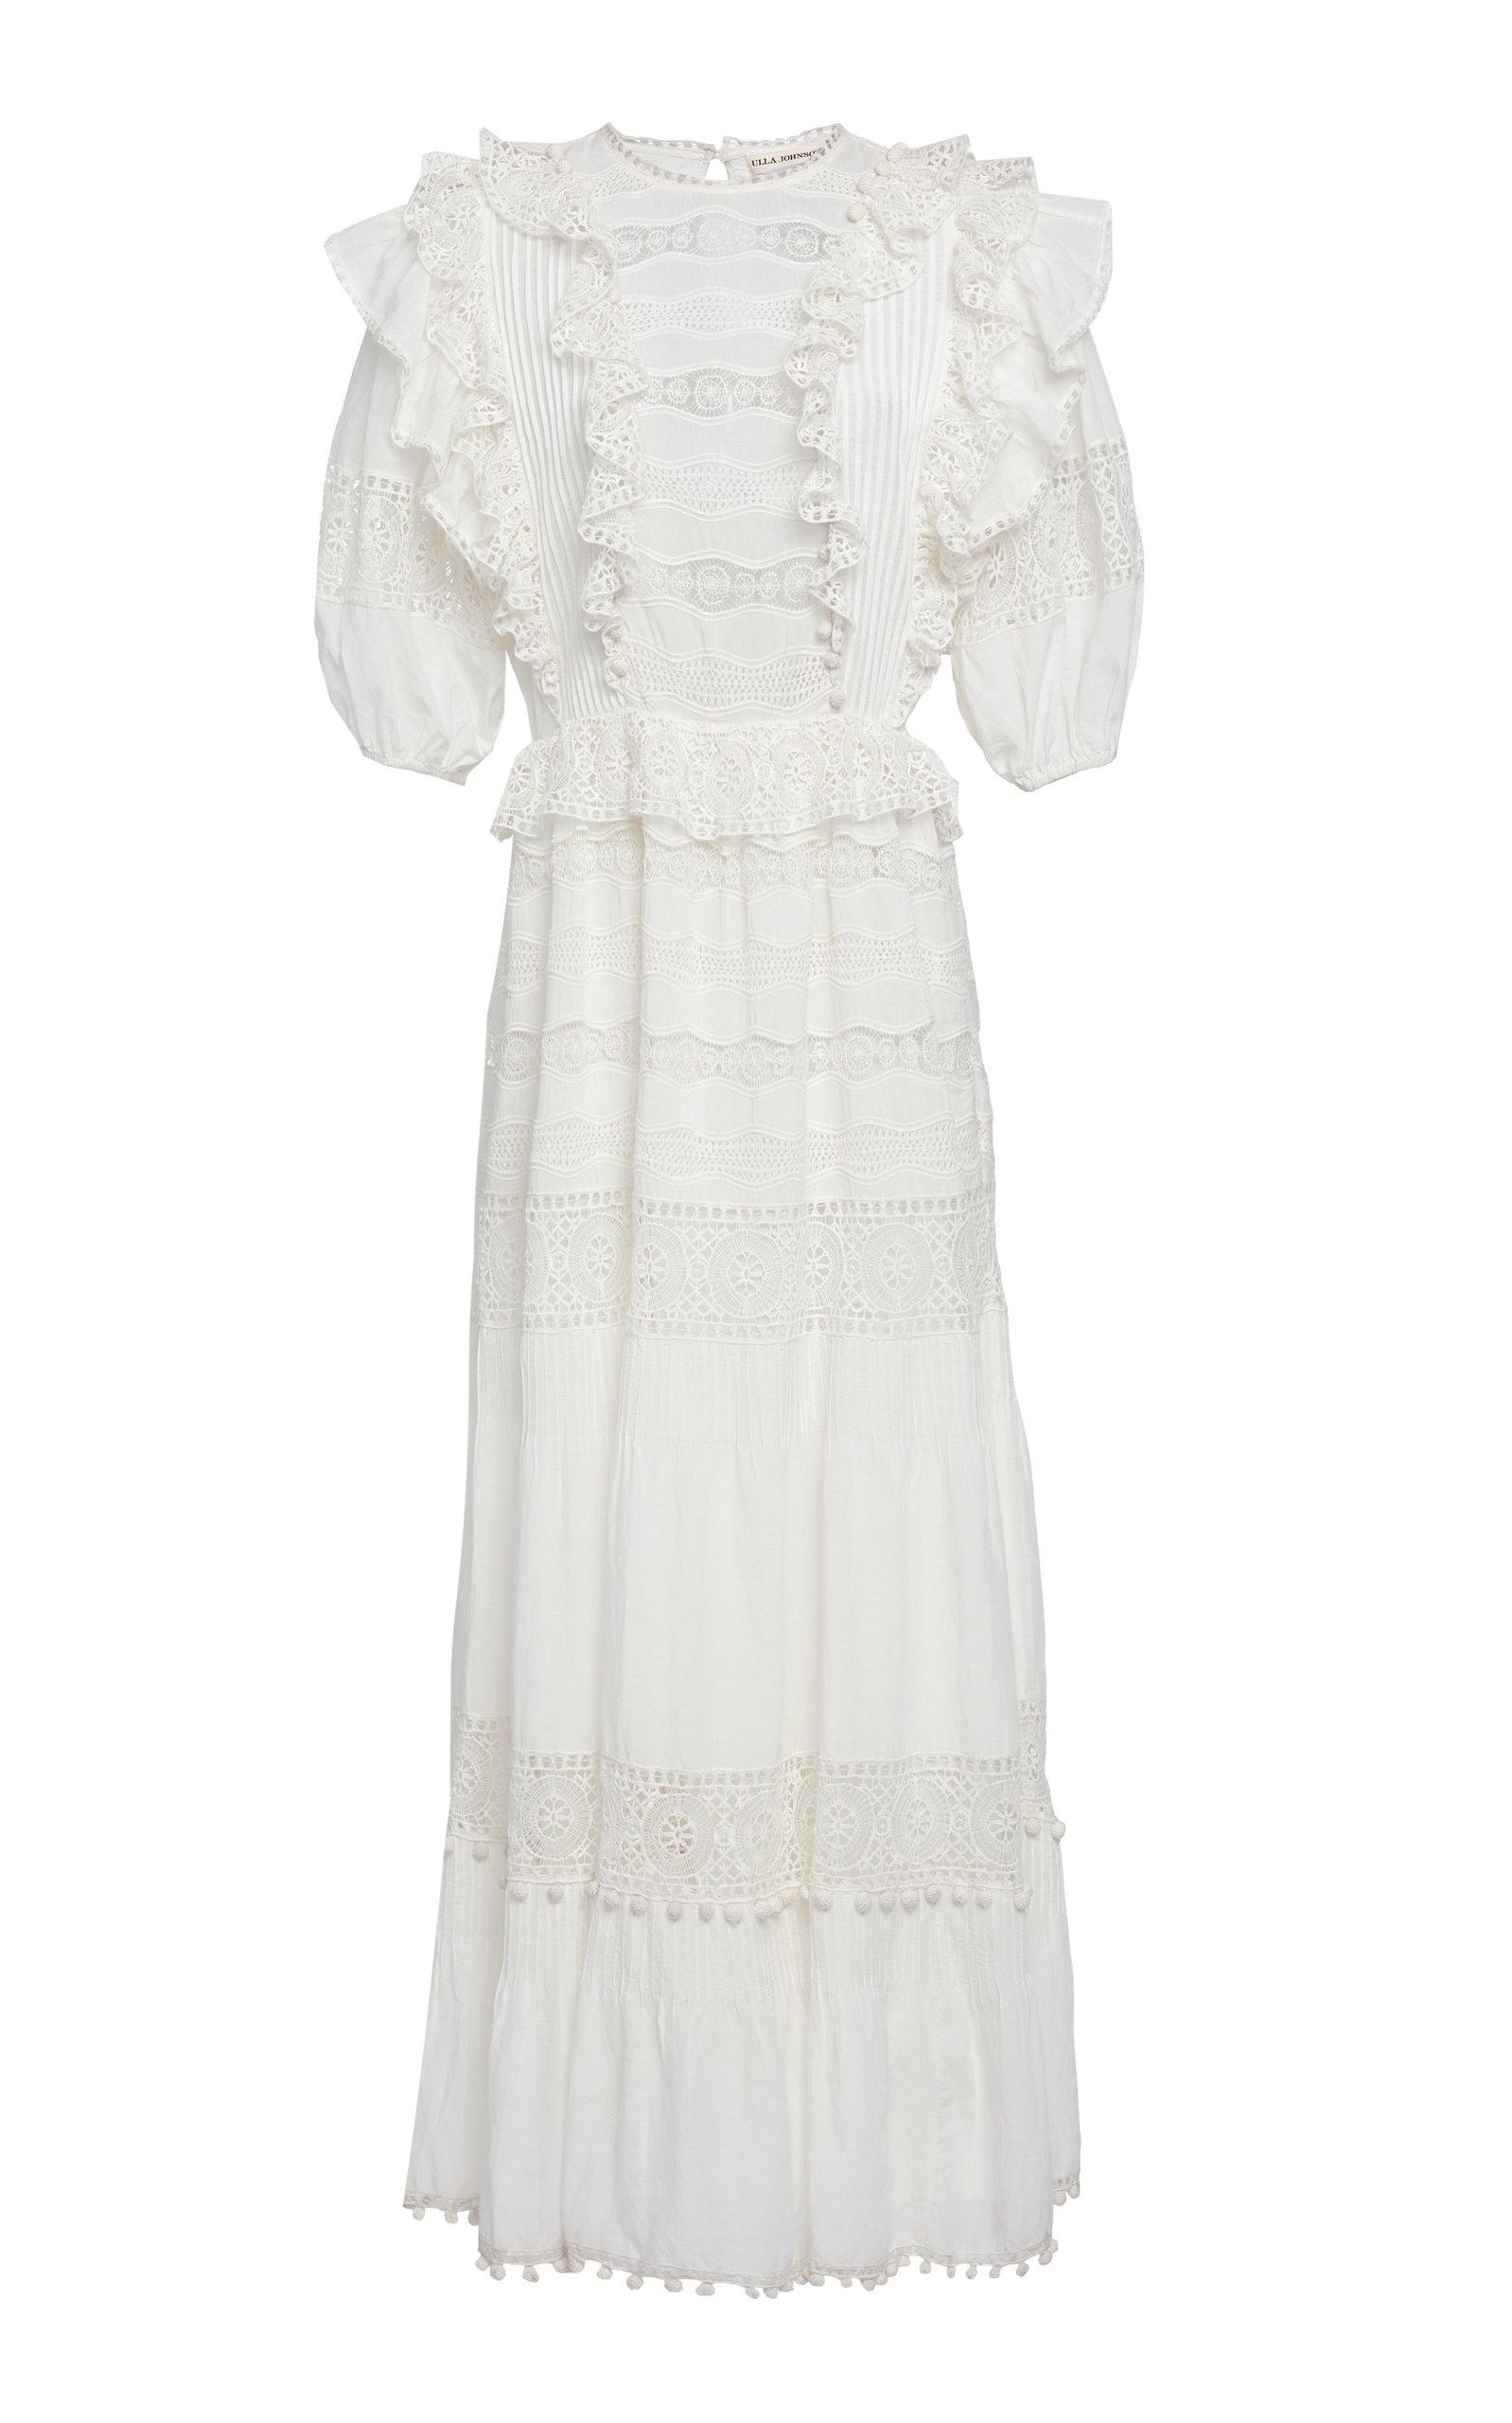 Guinivere Ruffled Cotton Blend Maxi Dress by Ulla Johnson